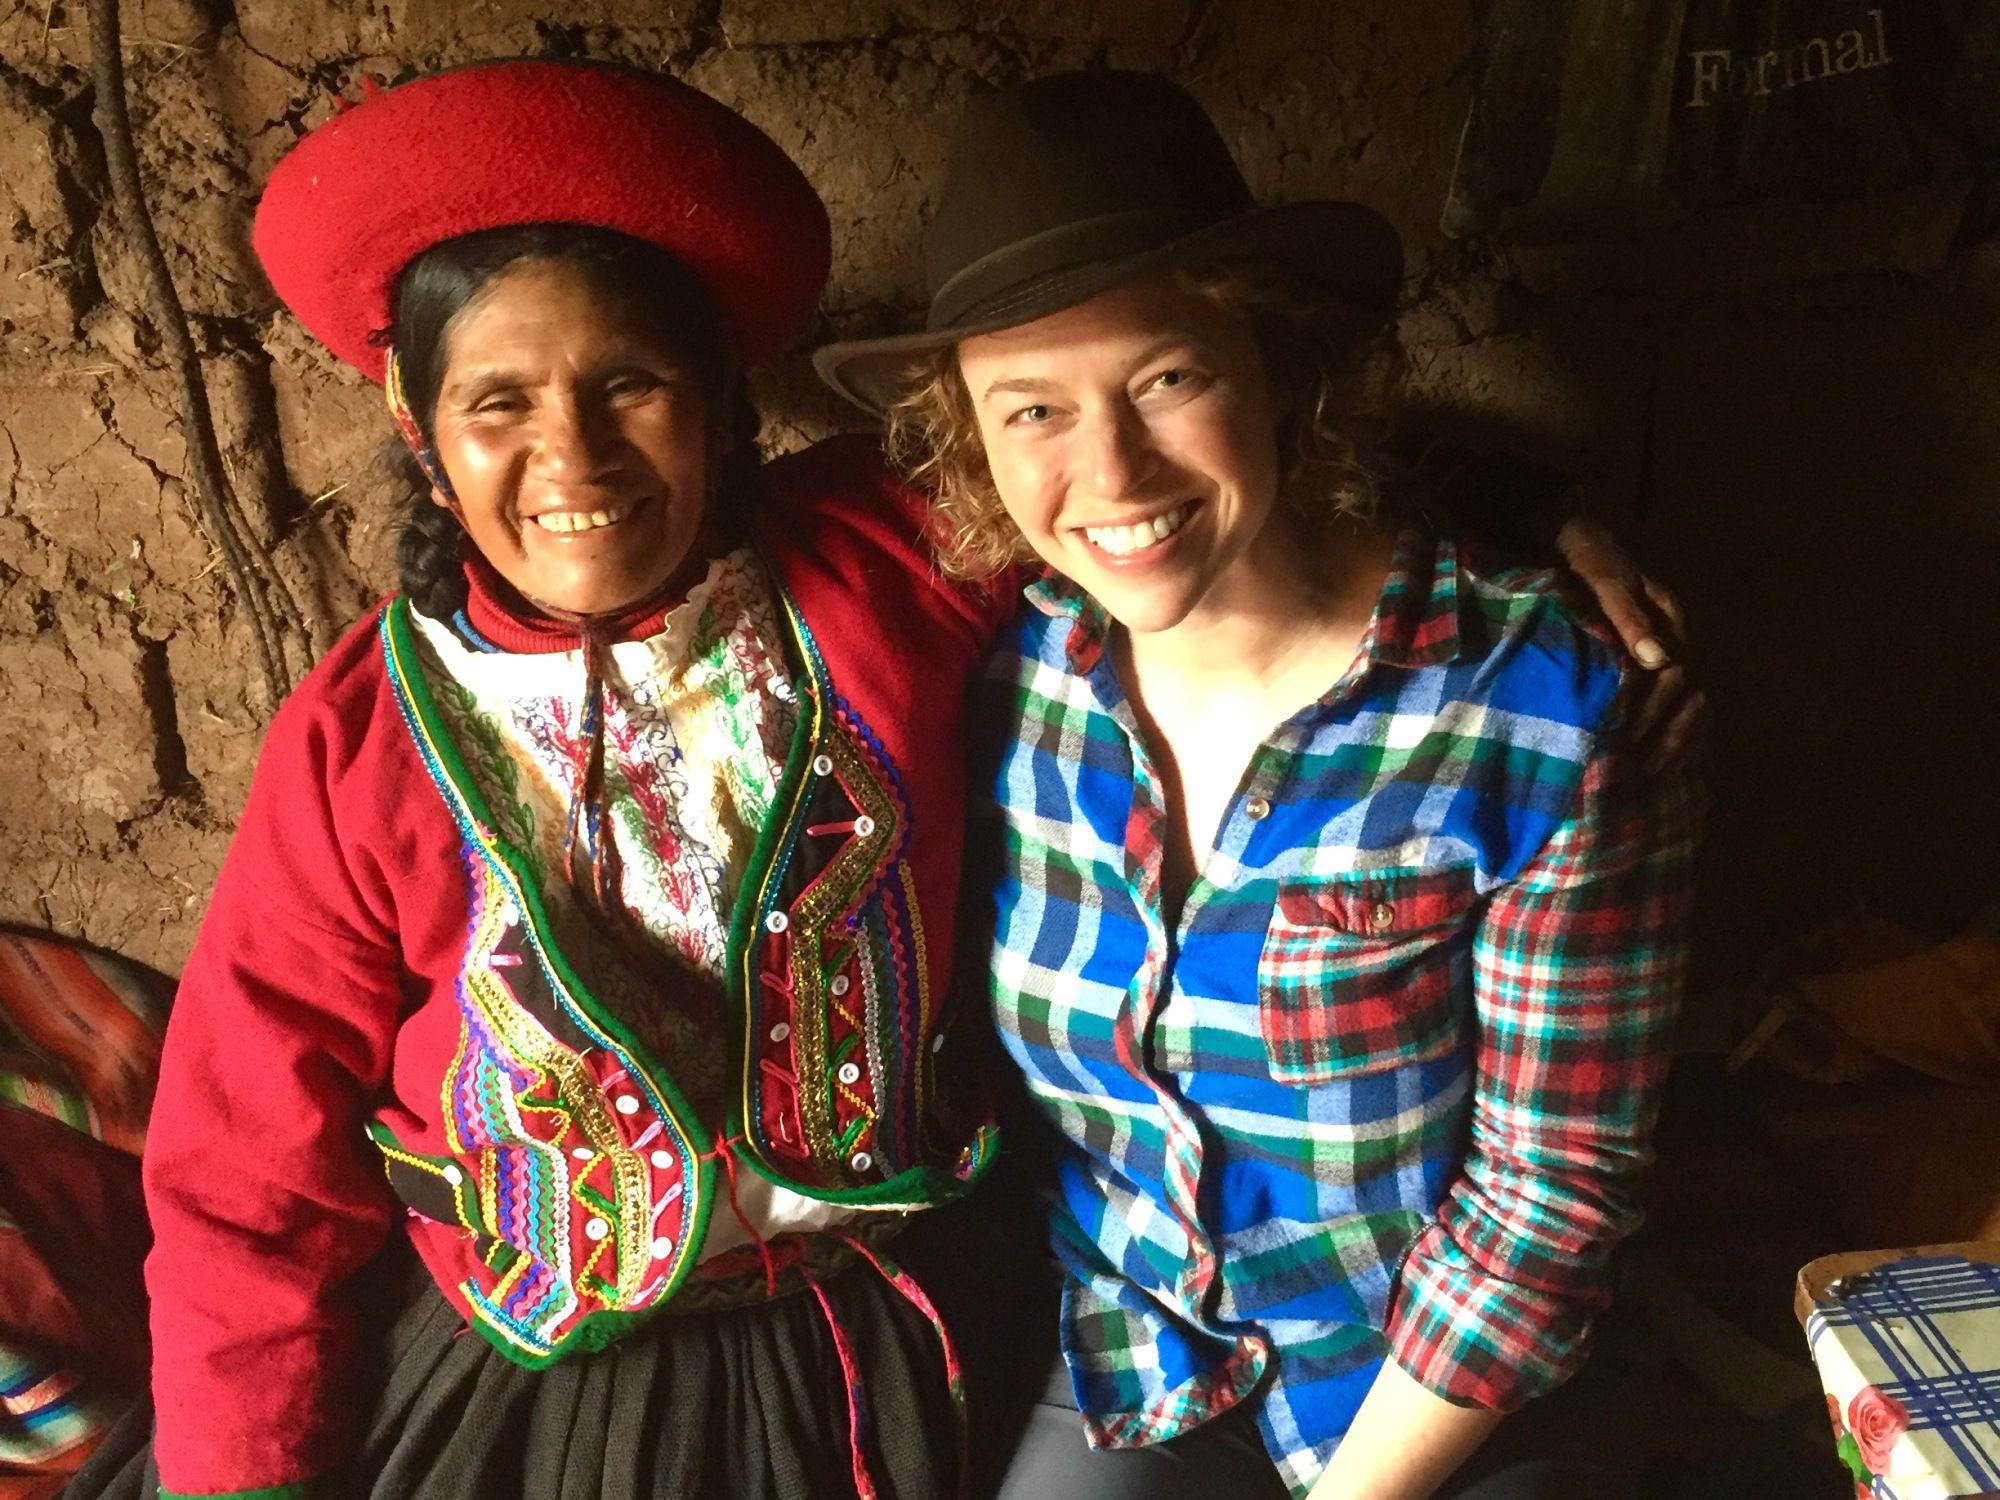 twirlygirltravels: Peru